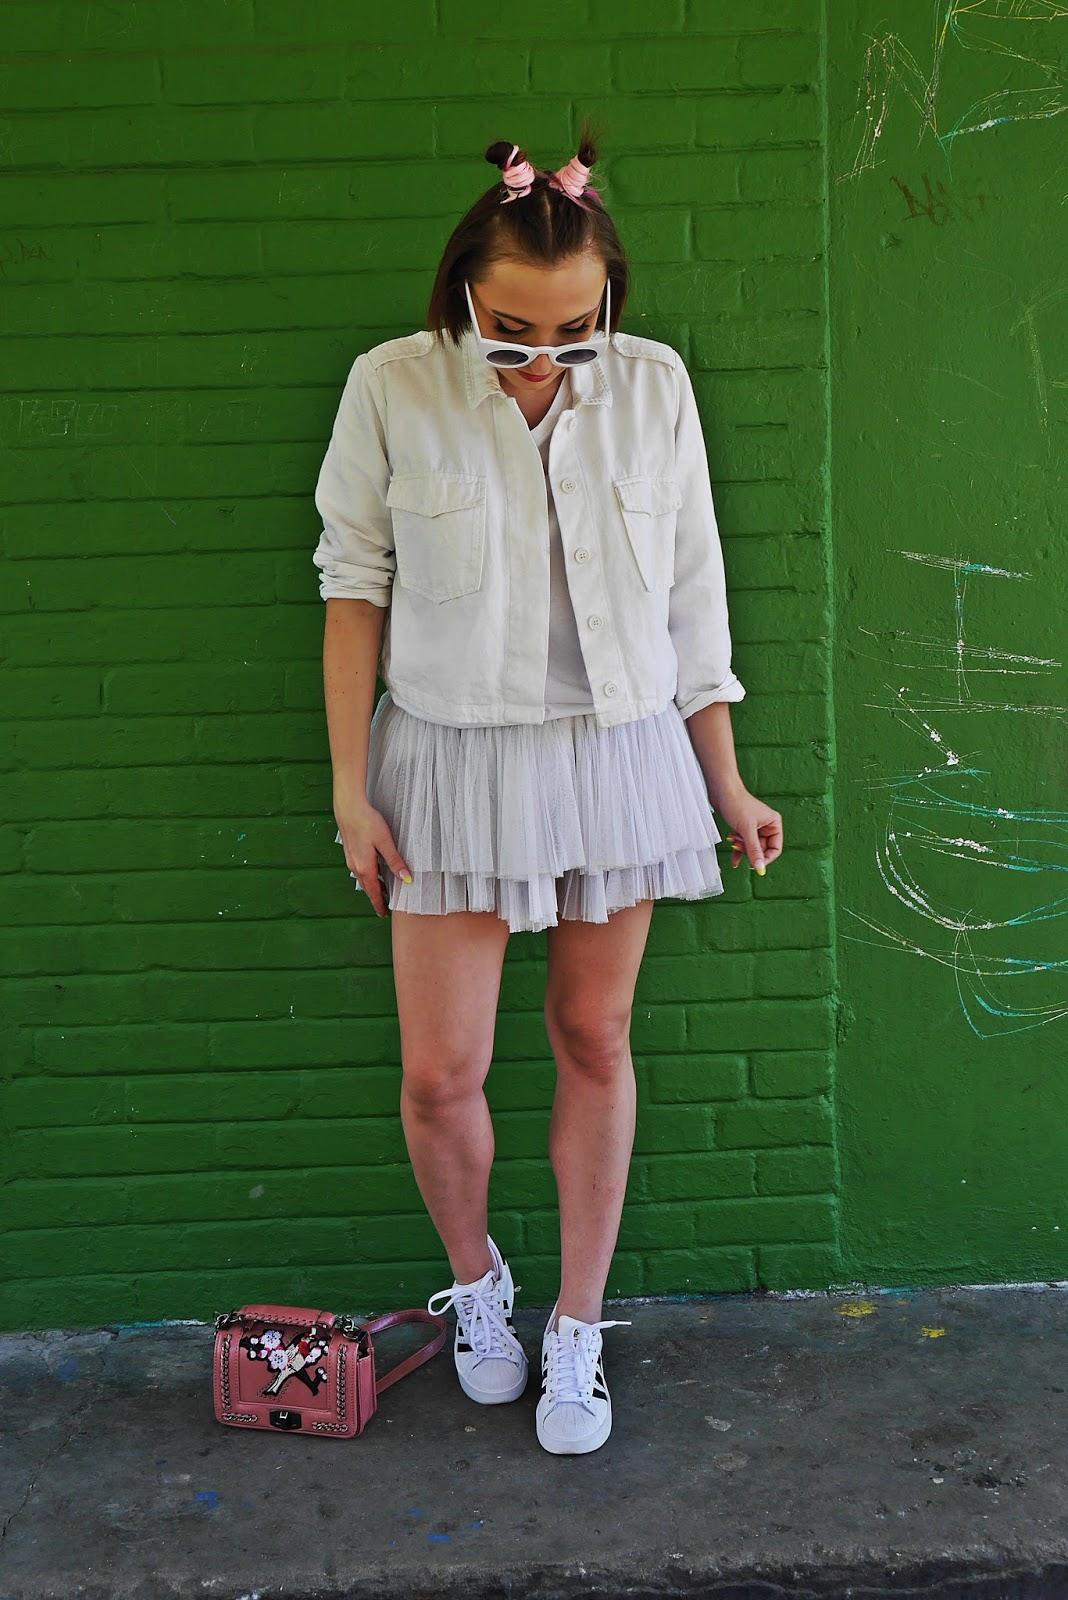 9_pulawy_blog_modowy_blogerka-modowa_karyn_look_160418